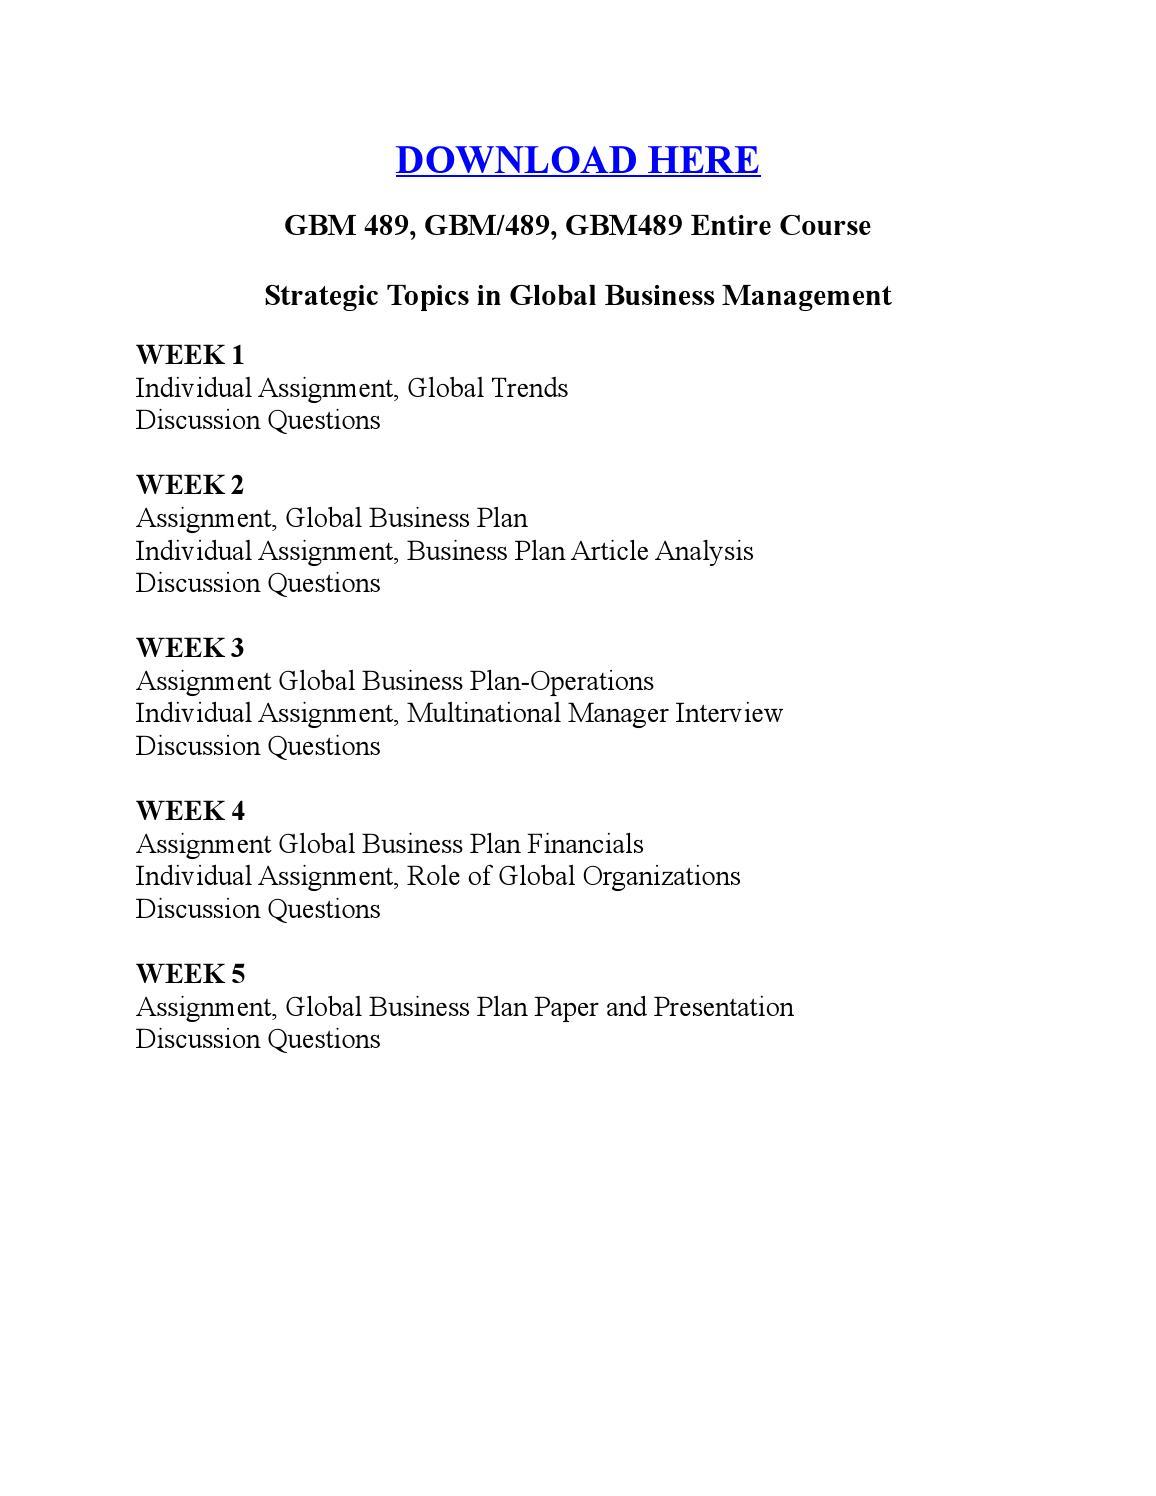 GBM 489, GBM/489, GBM489 Entire Course Strategic Topics in